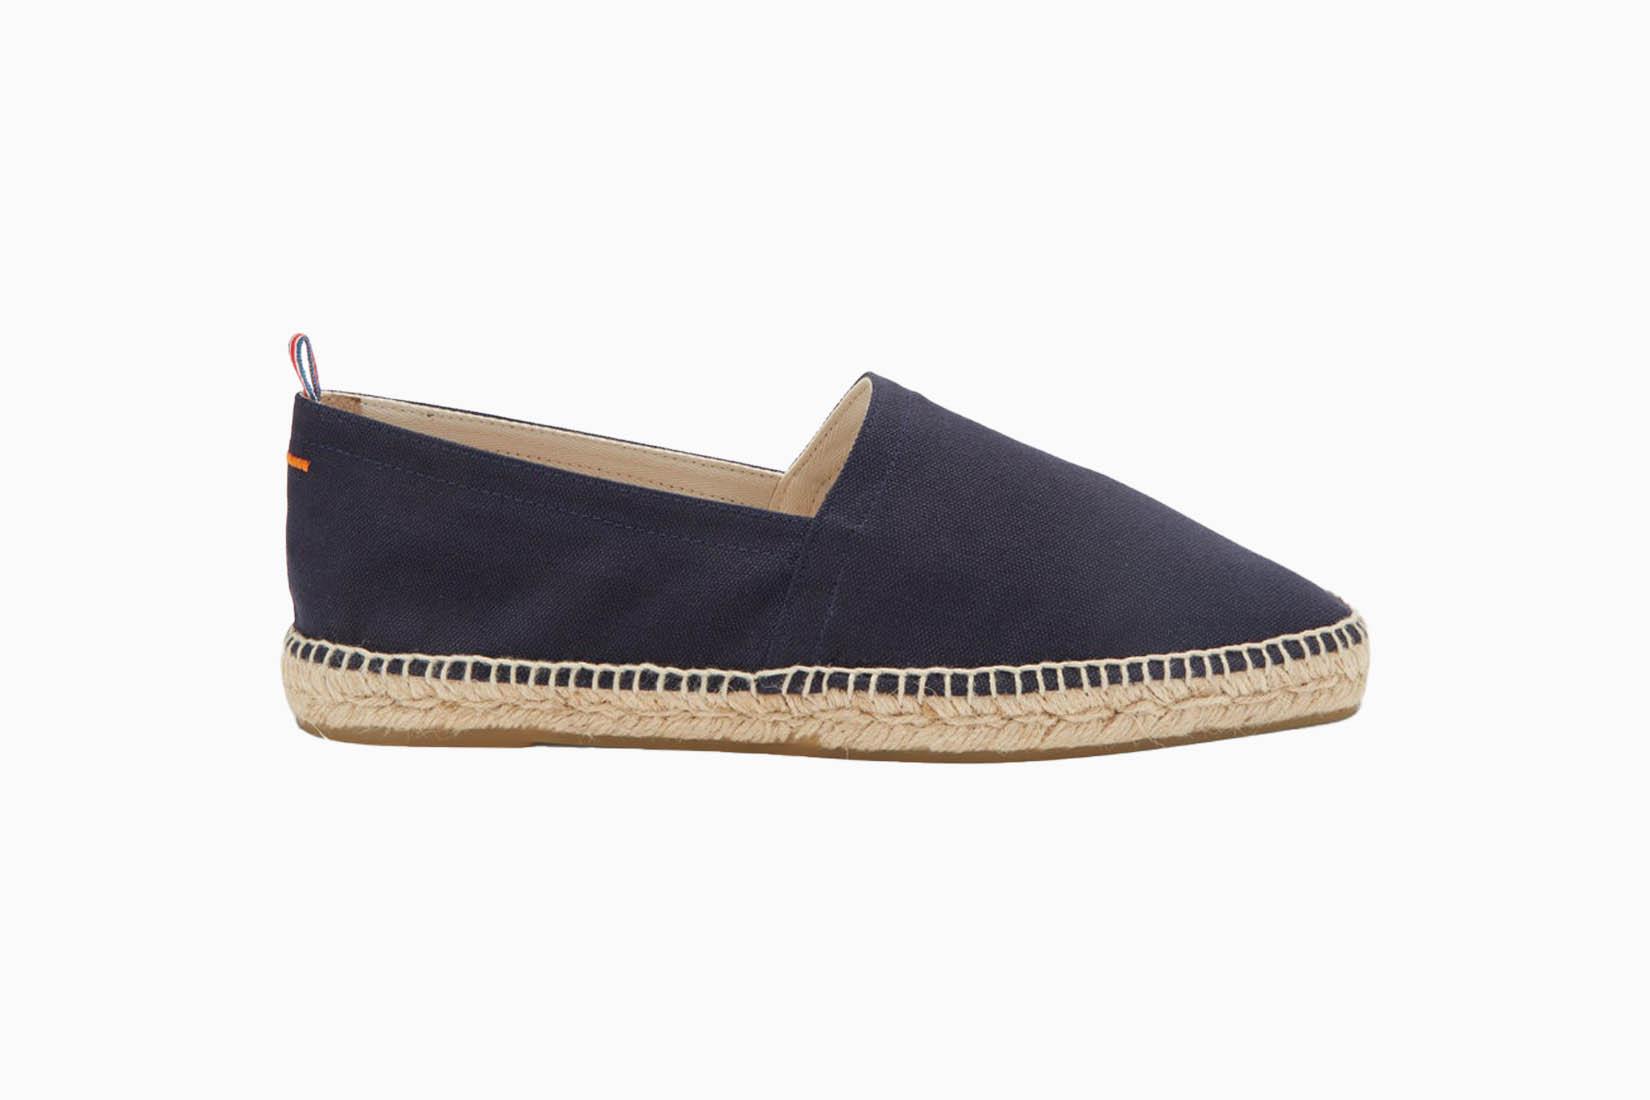 best casual shoes men castaner espadrilles review Luxe Digital